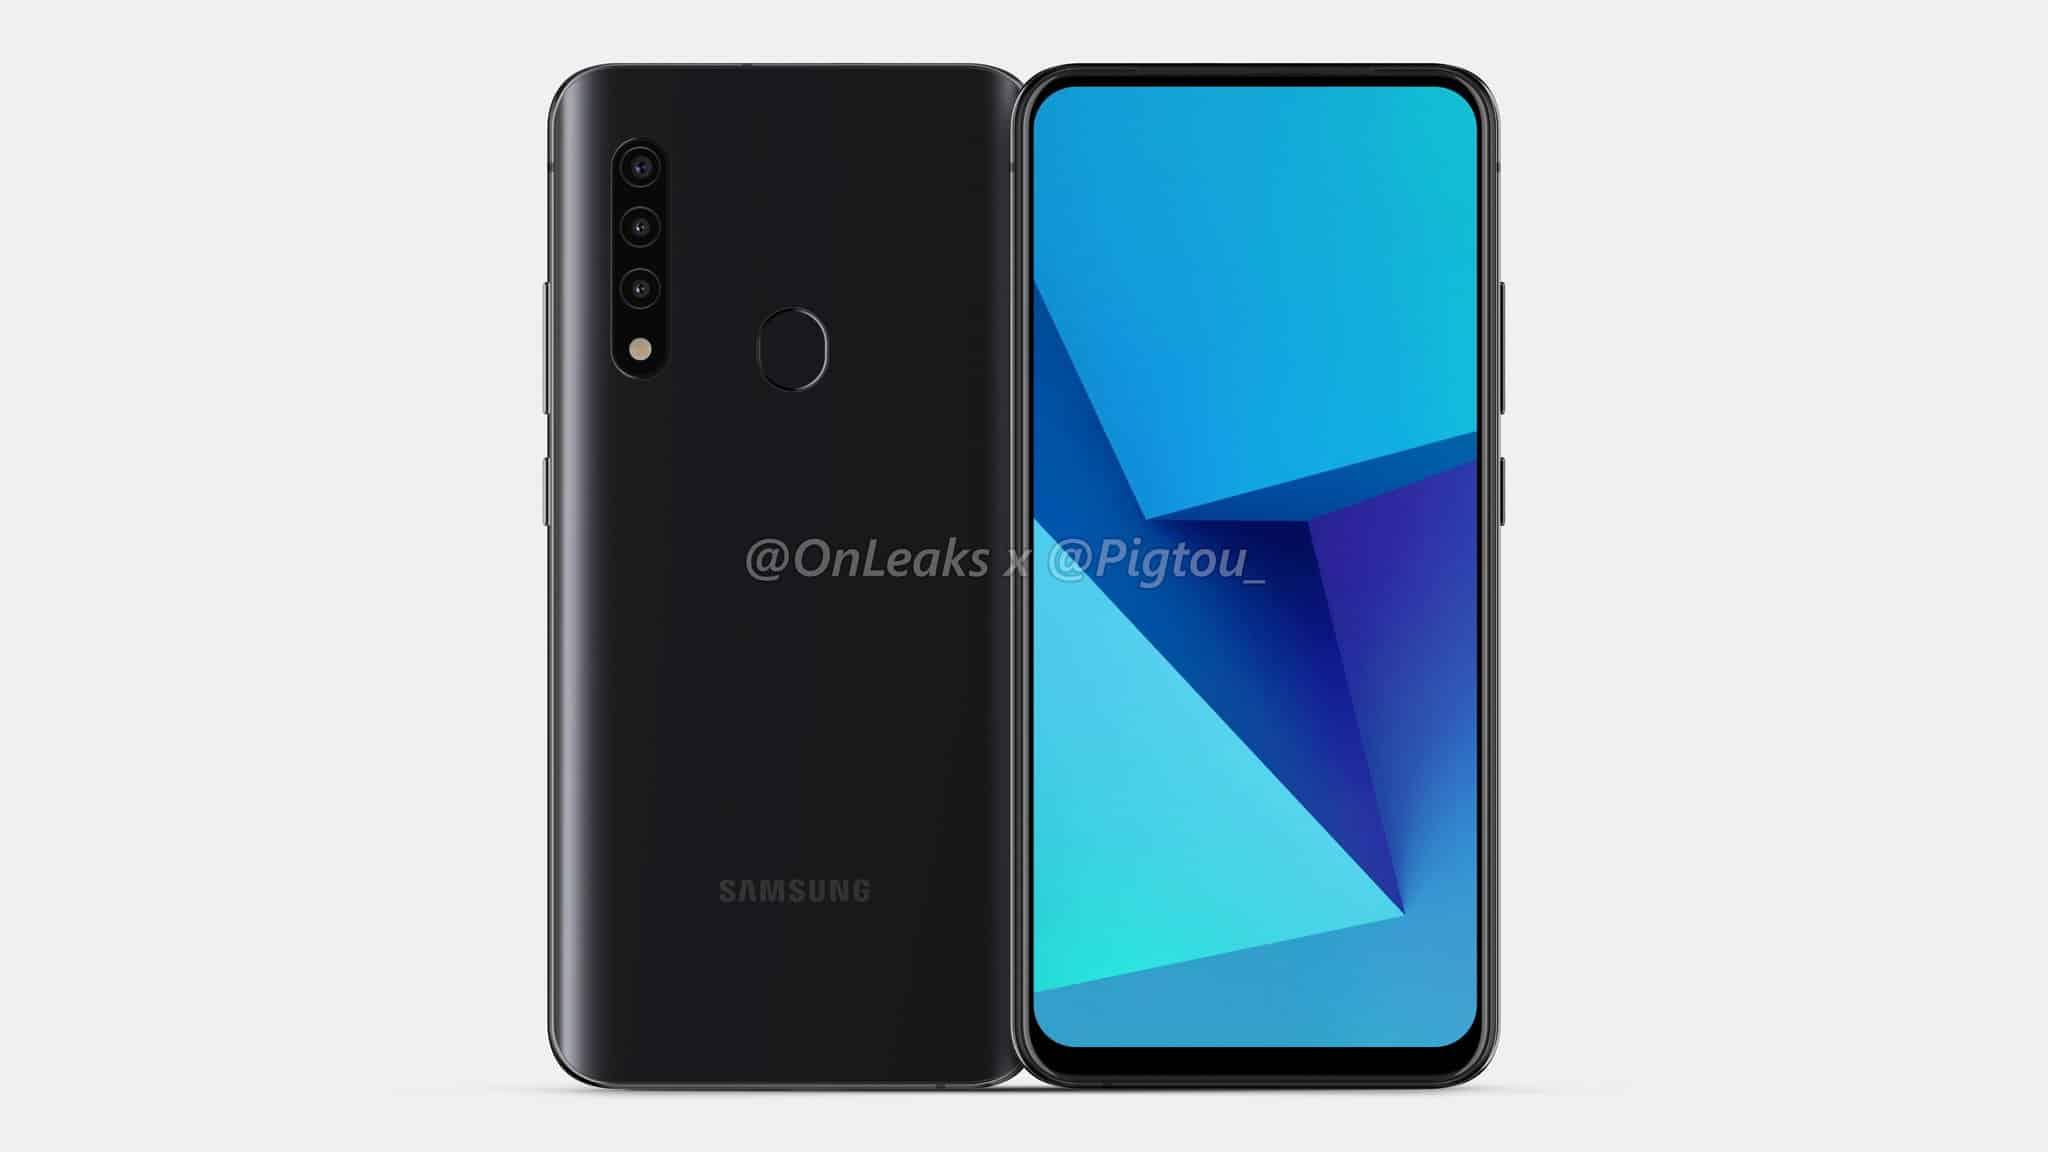 Samsung first smartphone pop up camera leak 1